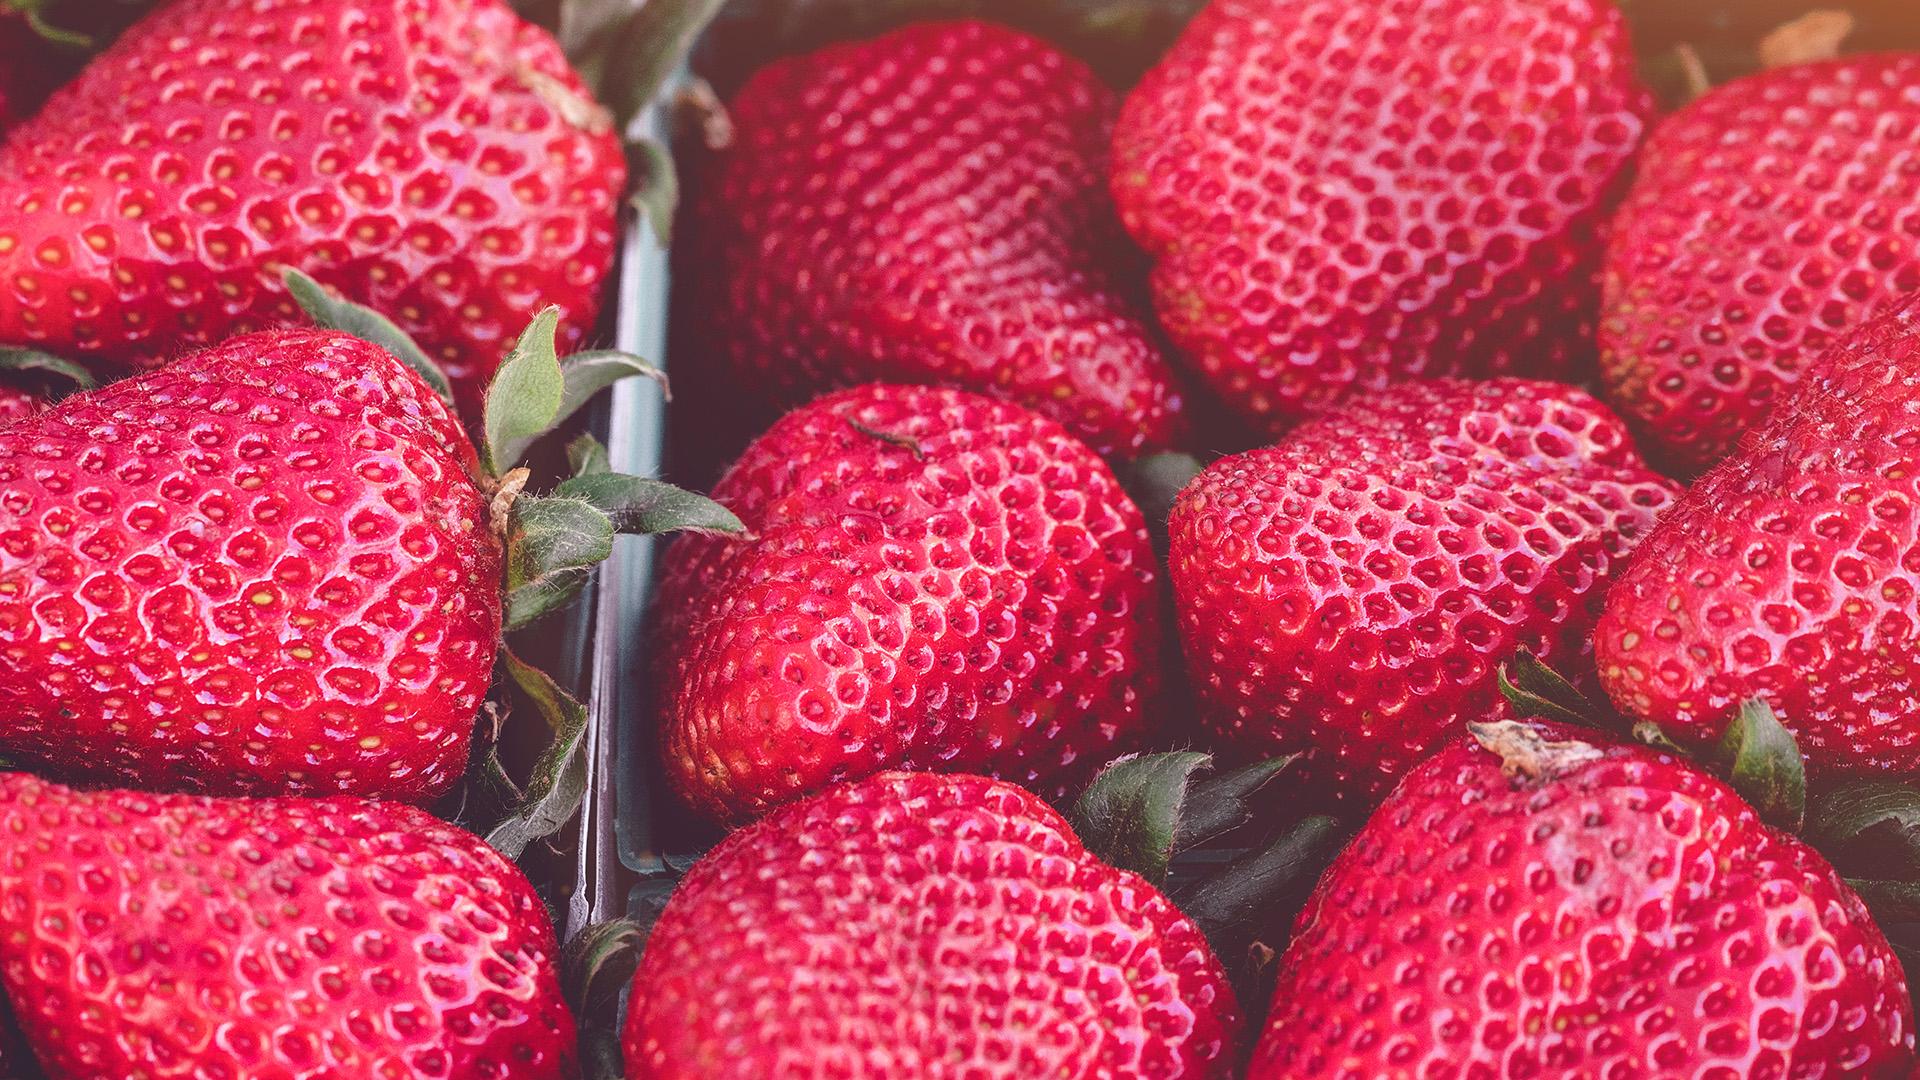 Strawberry New season In summary